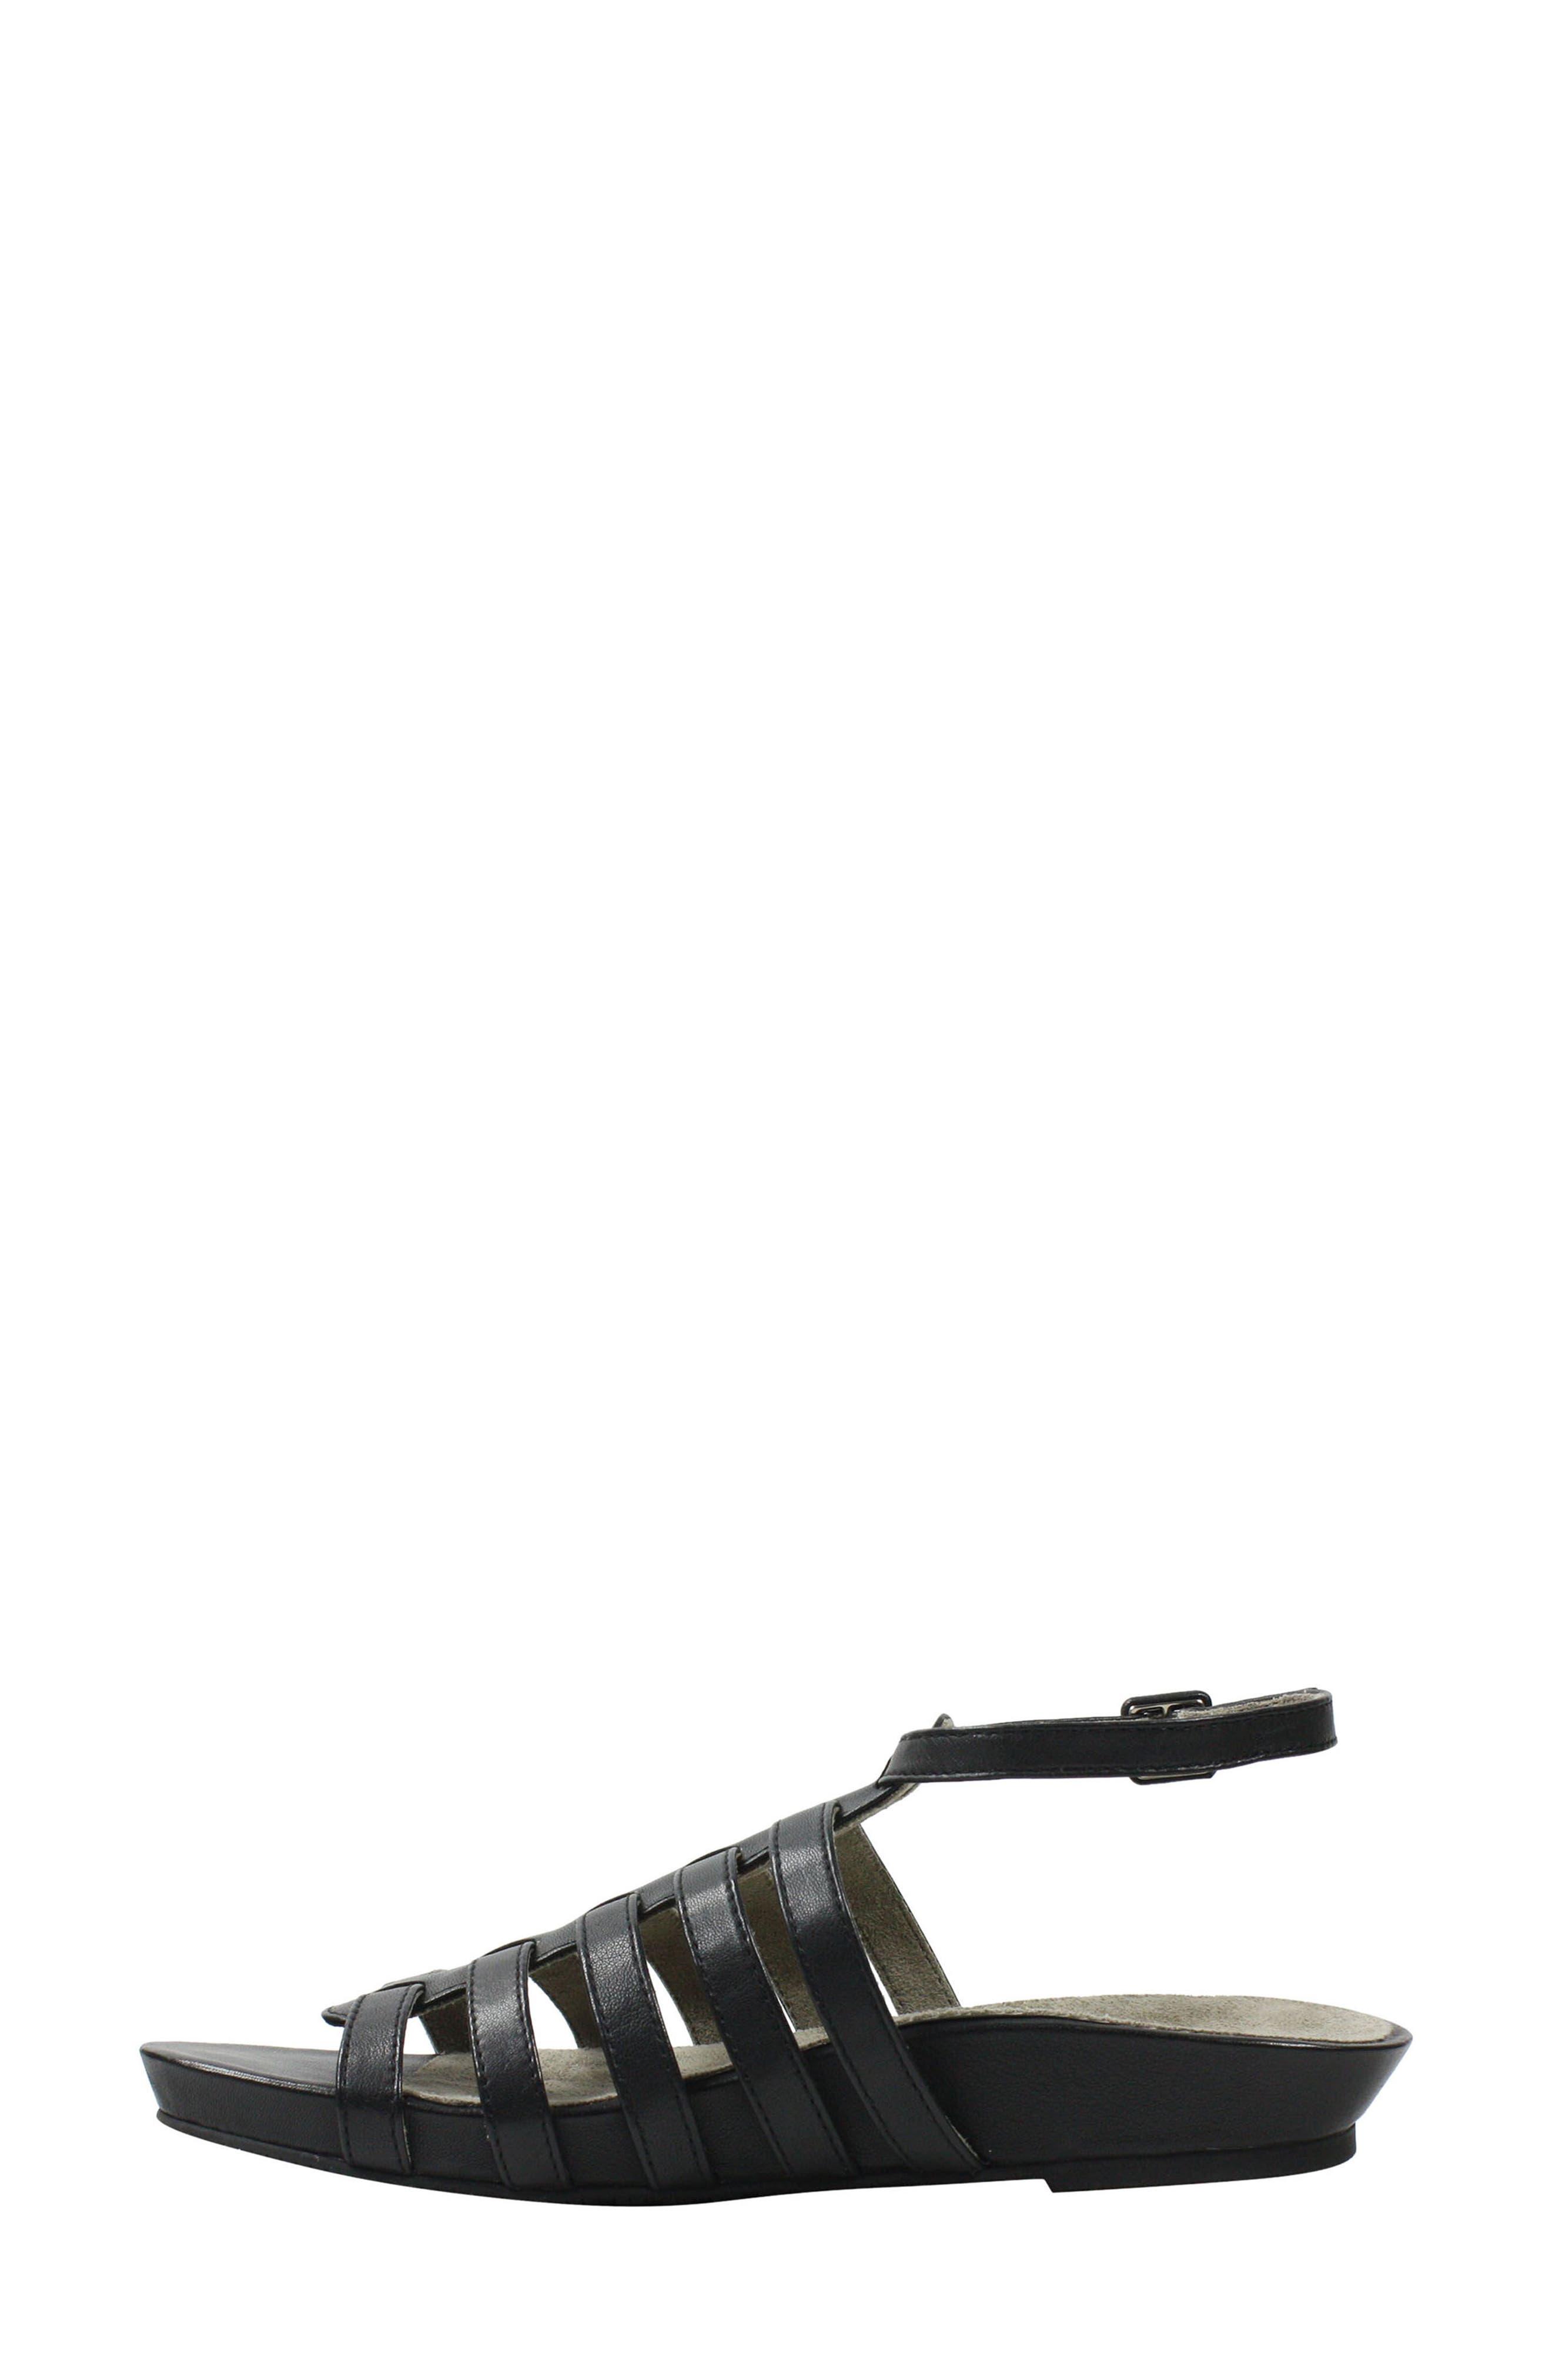 Delmor Ankle Strap Sandal,                             Alternate thumbnail 3, color,                             BLACK LEATHER